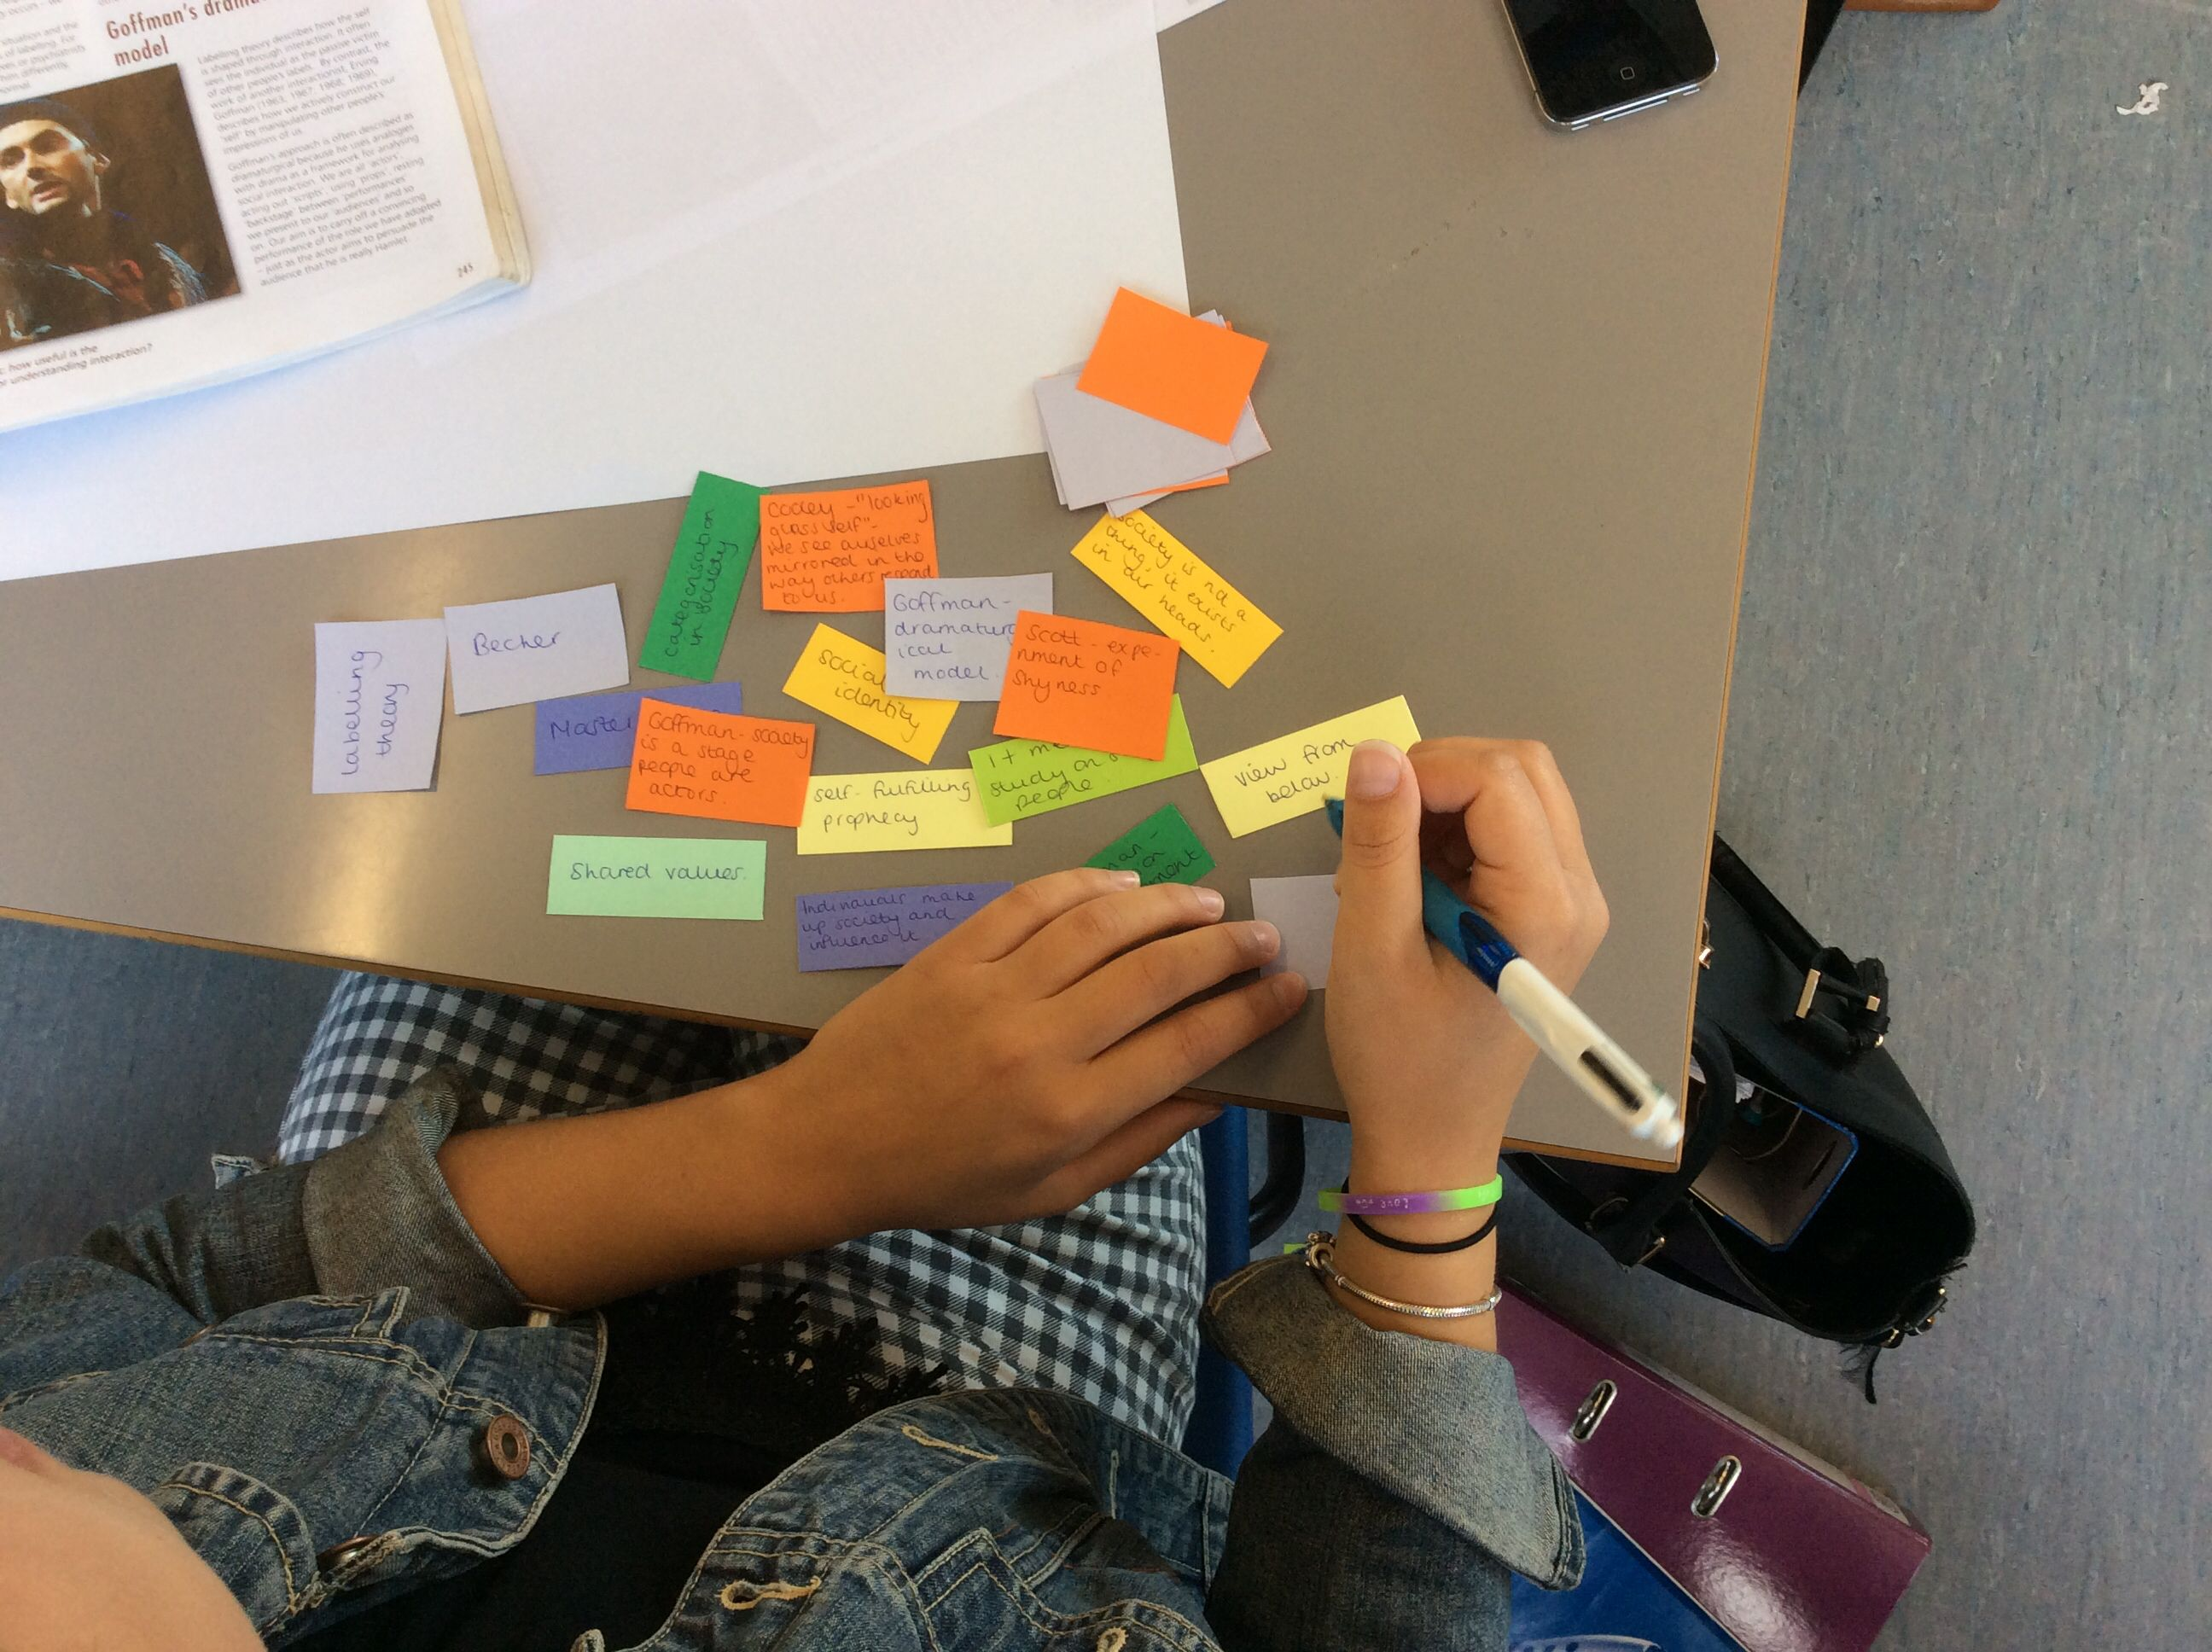 Symbolic interactionism flipped learning activity